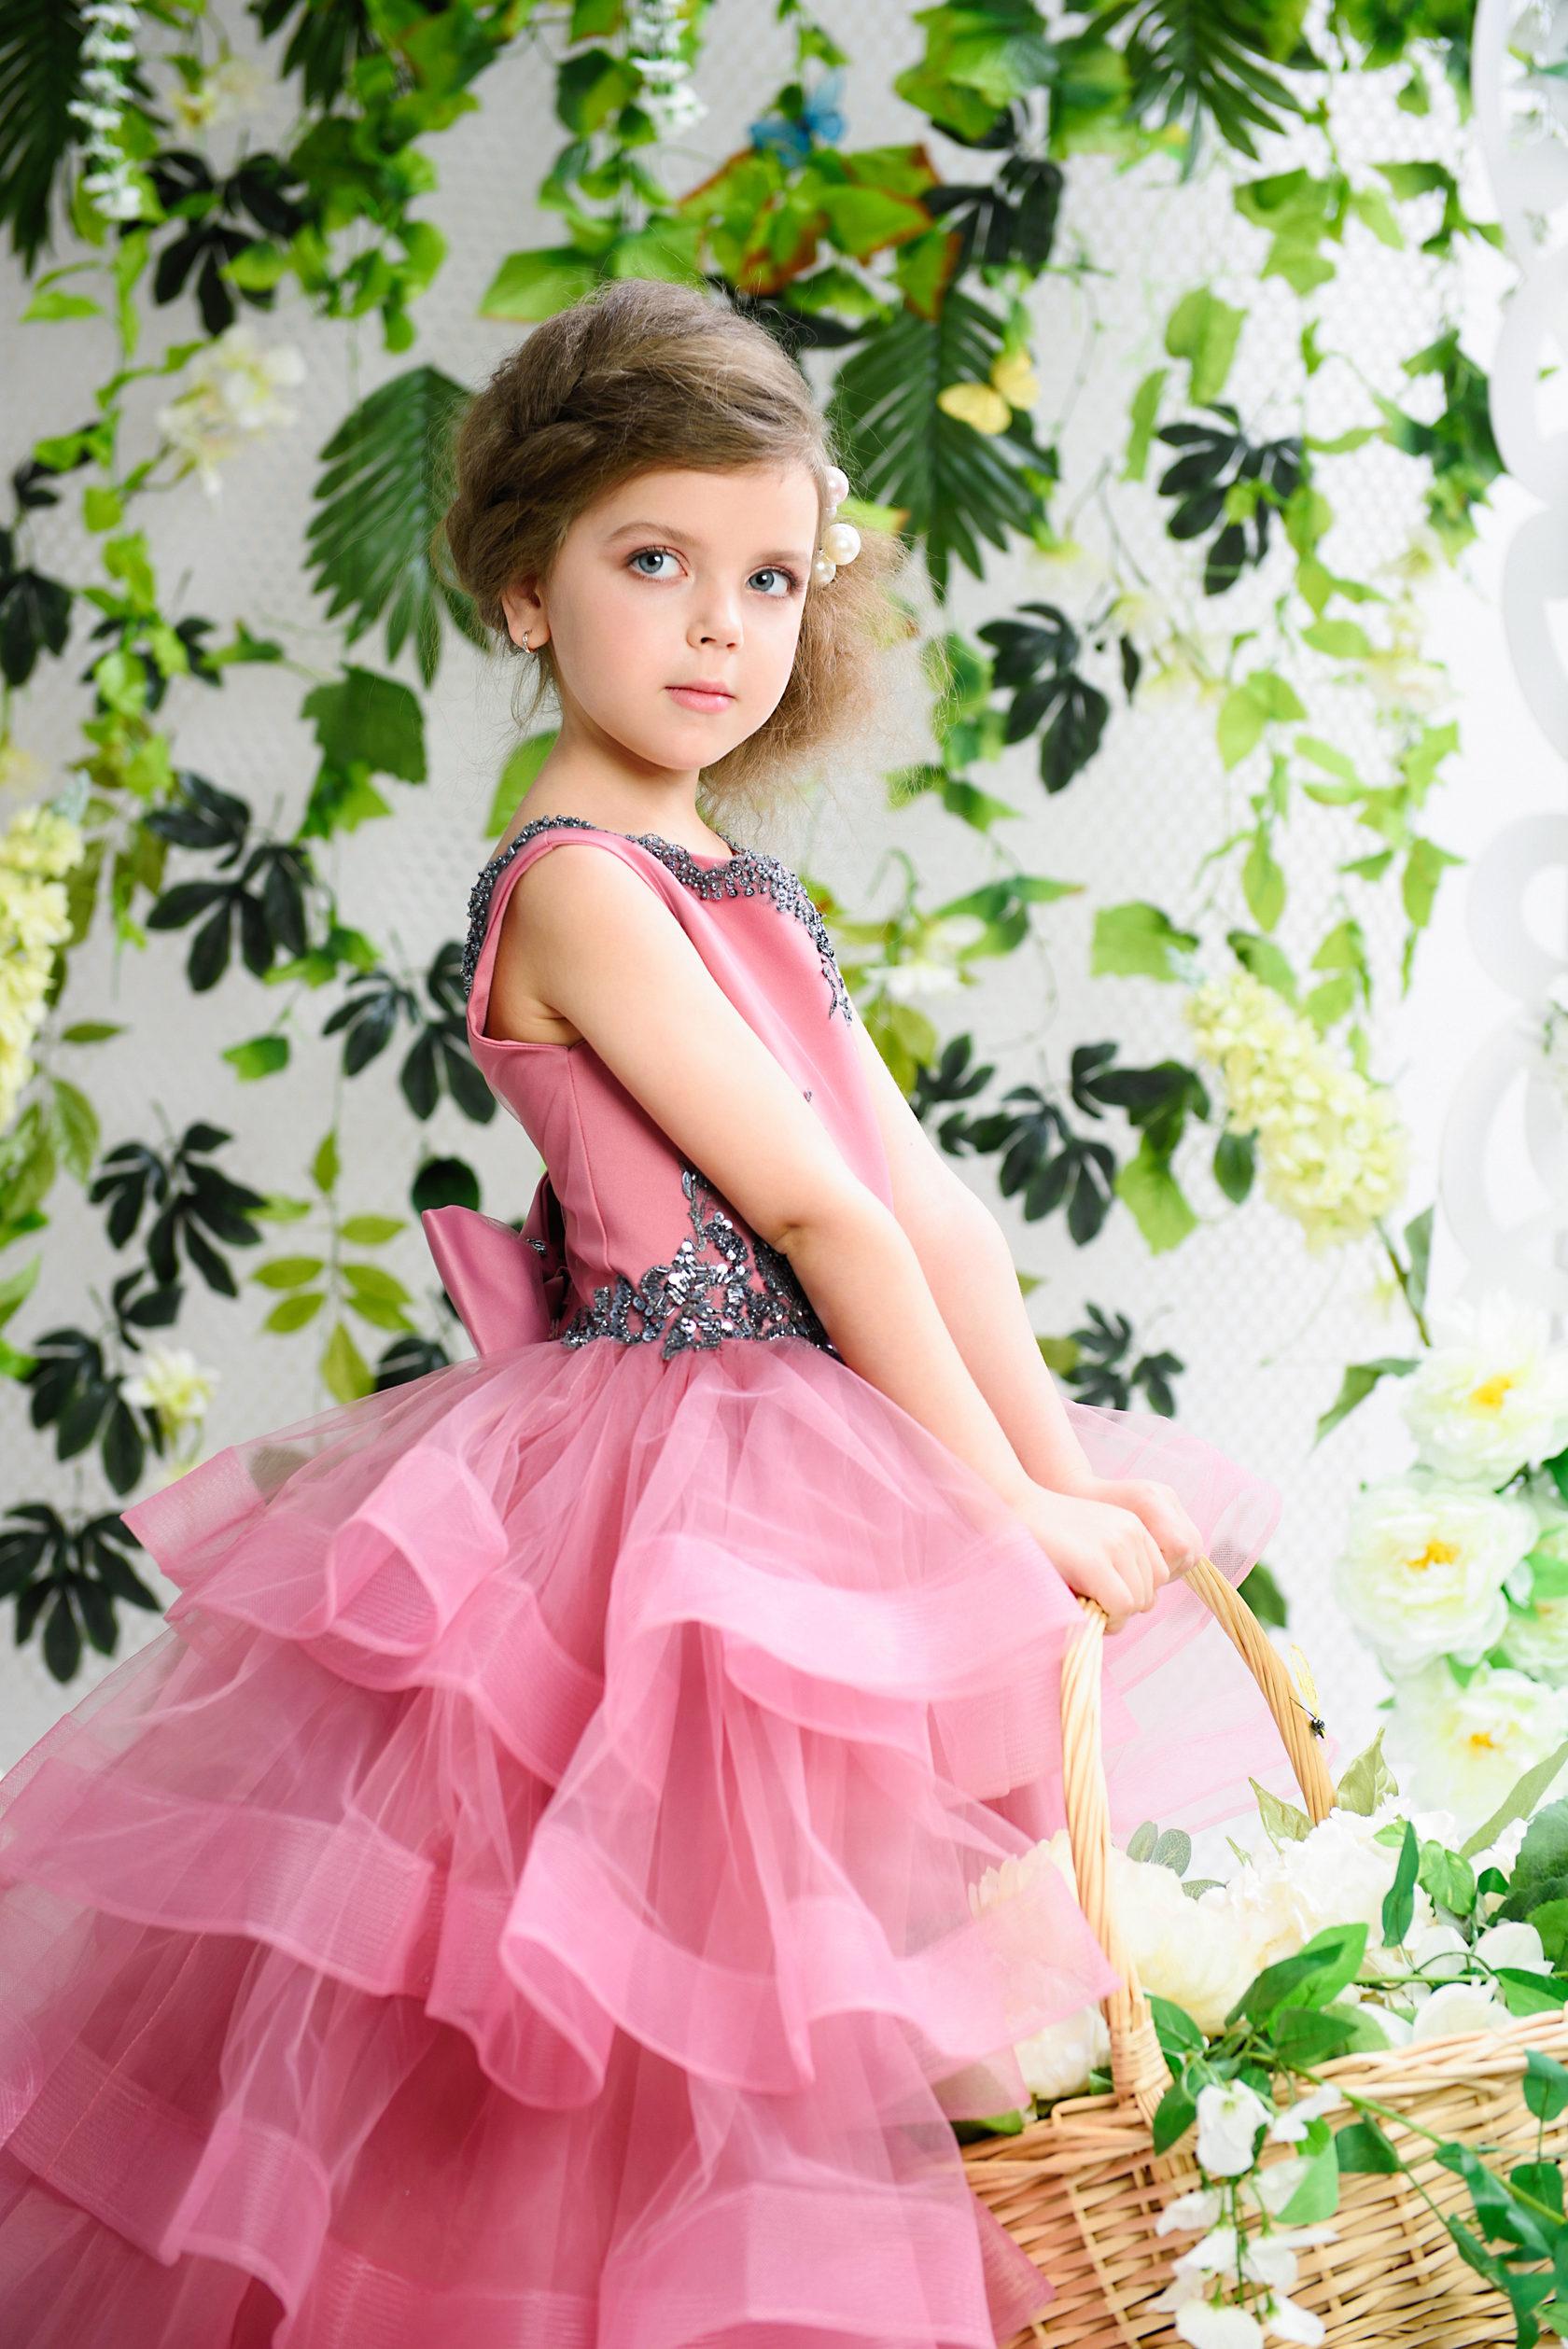 Дети модели стихи